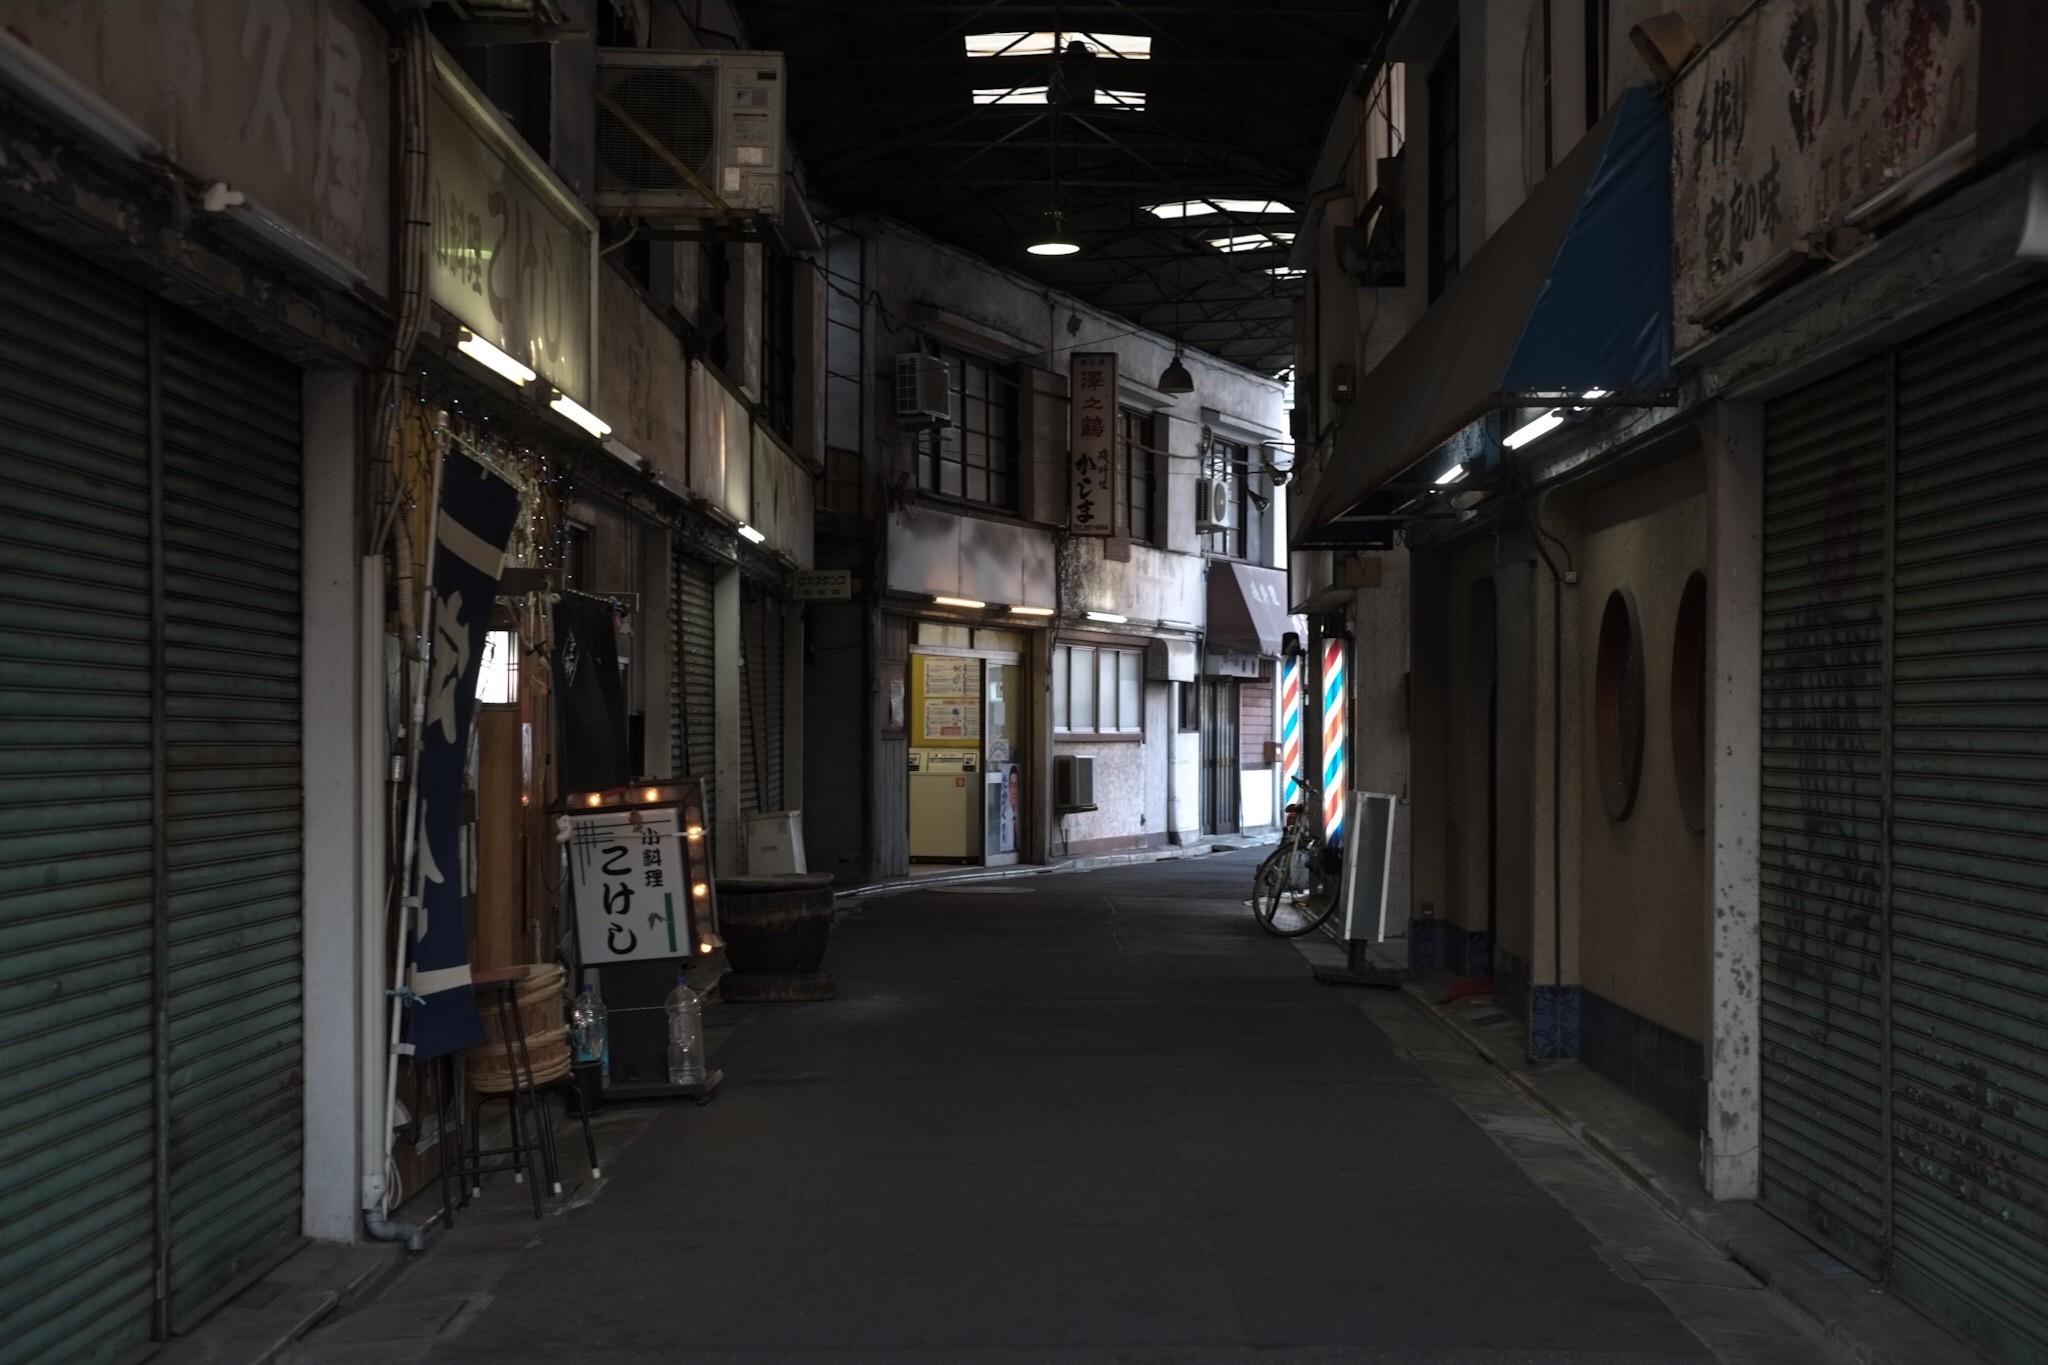 f:id:Yamadamado:20201229133342j:image